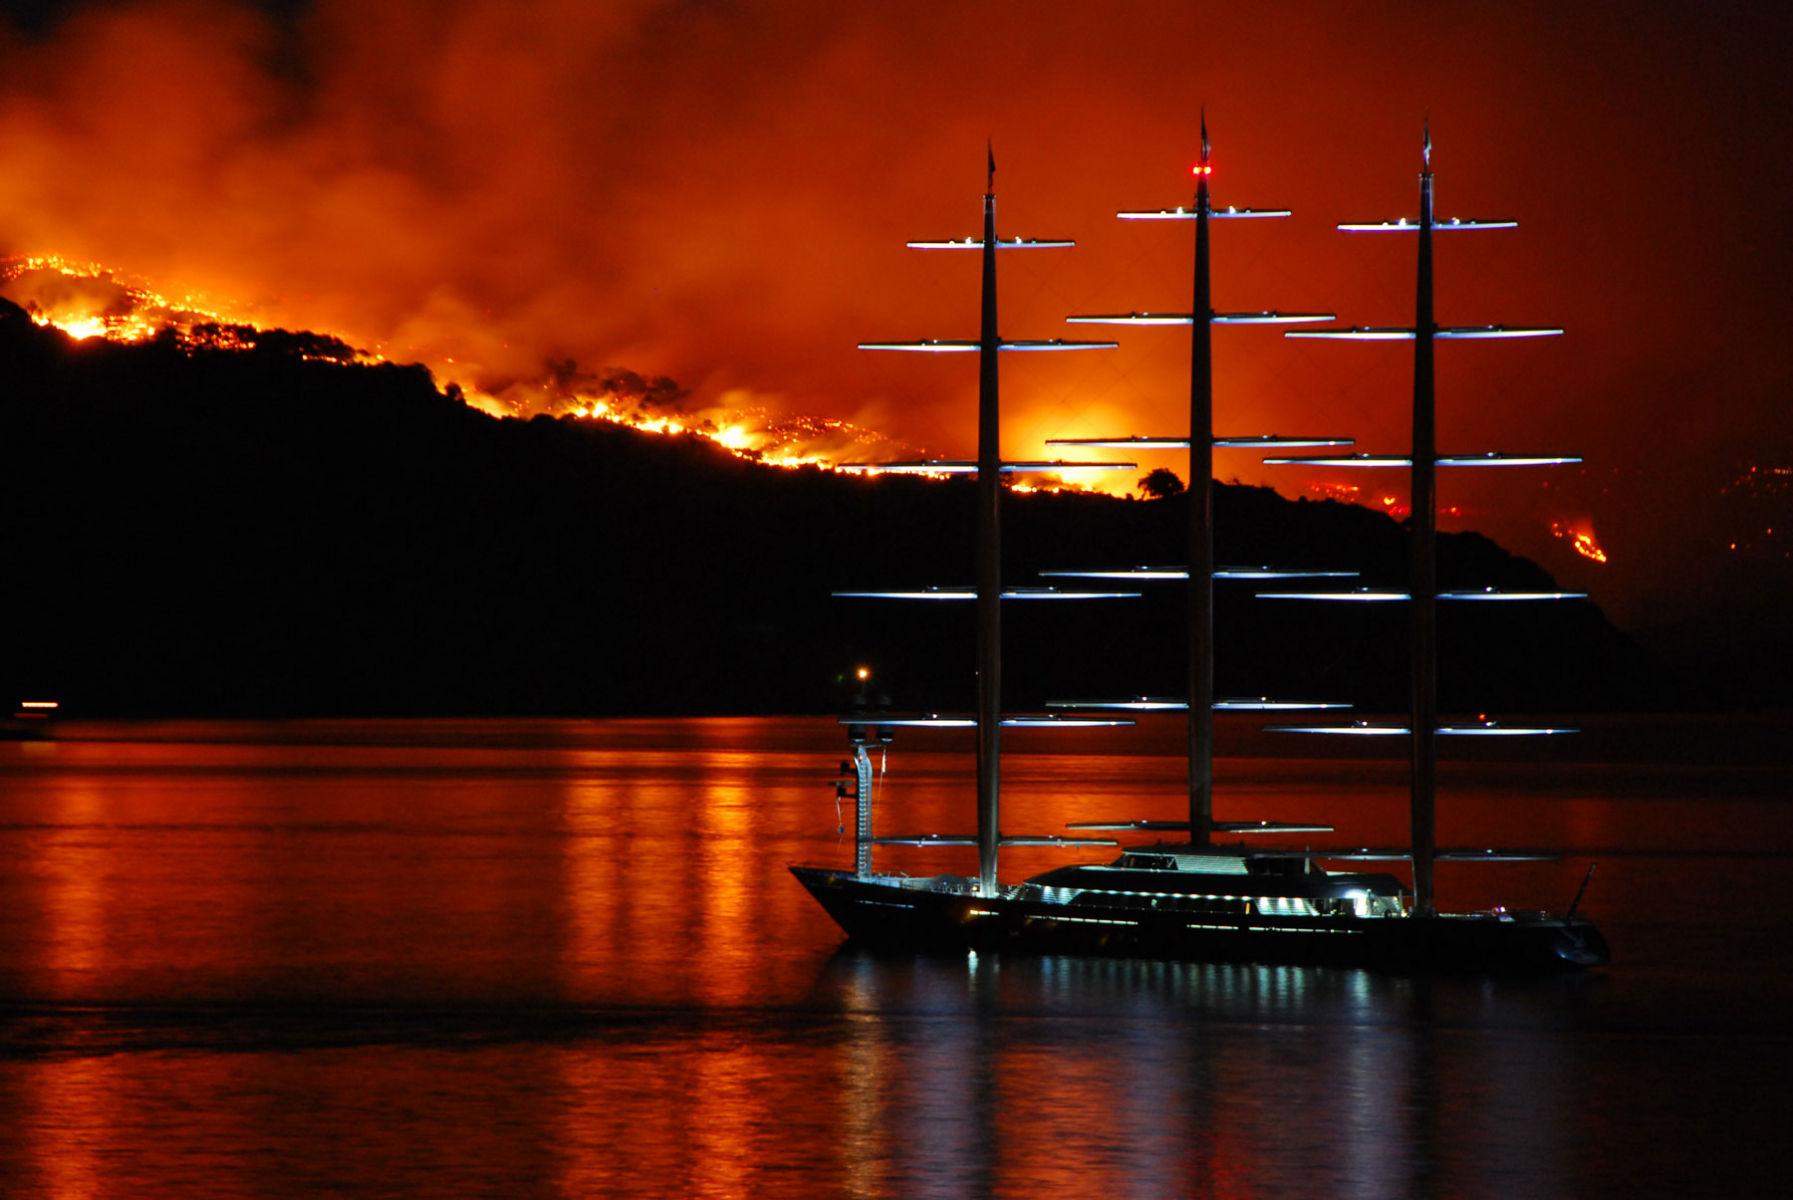 Maltese Falcon And the Angel Island Fire